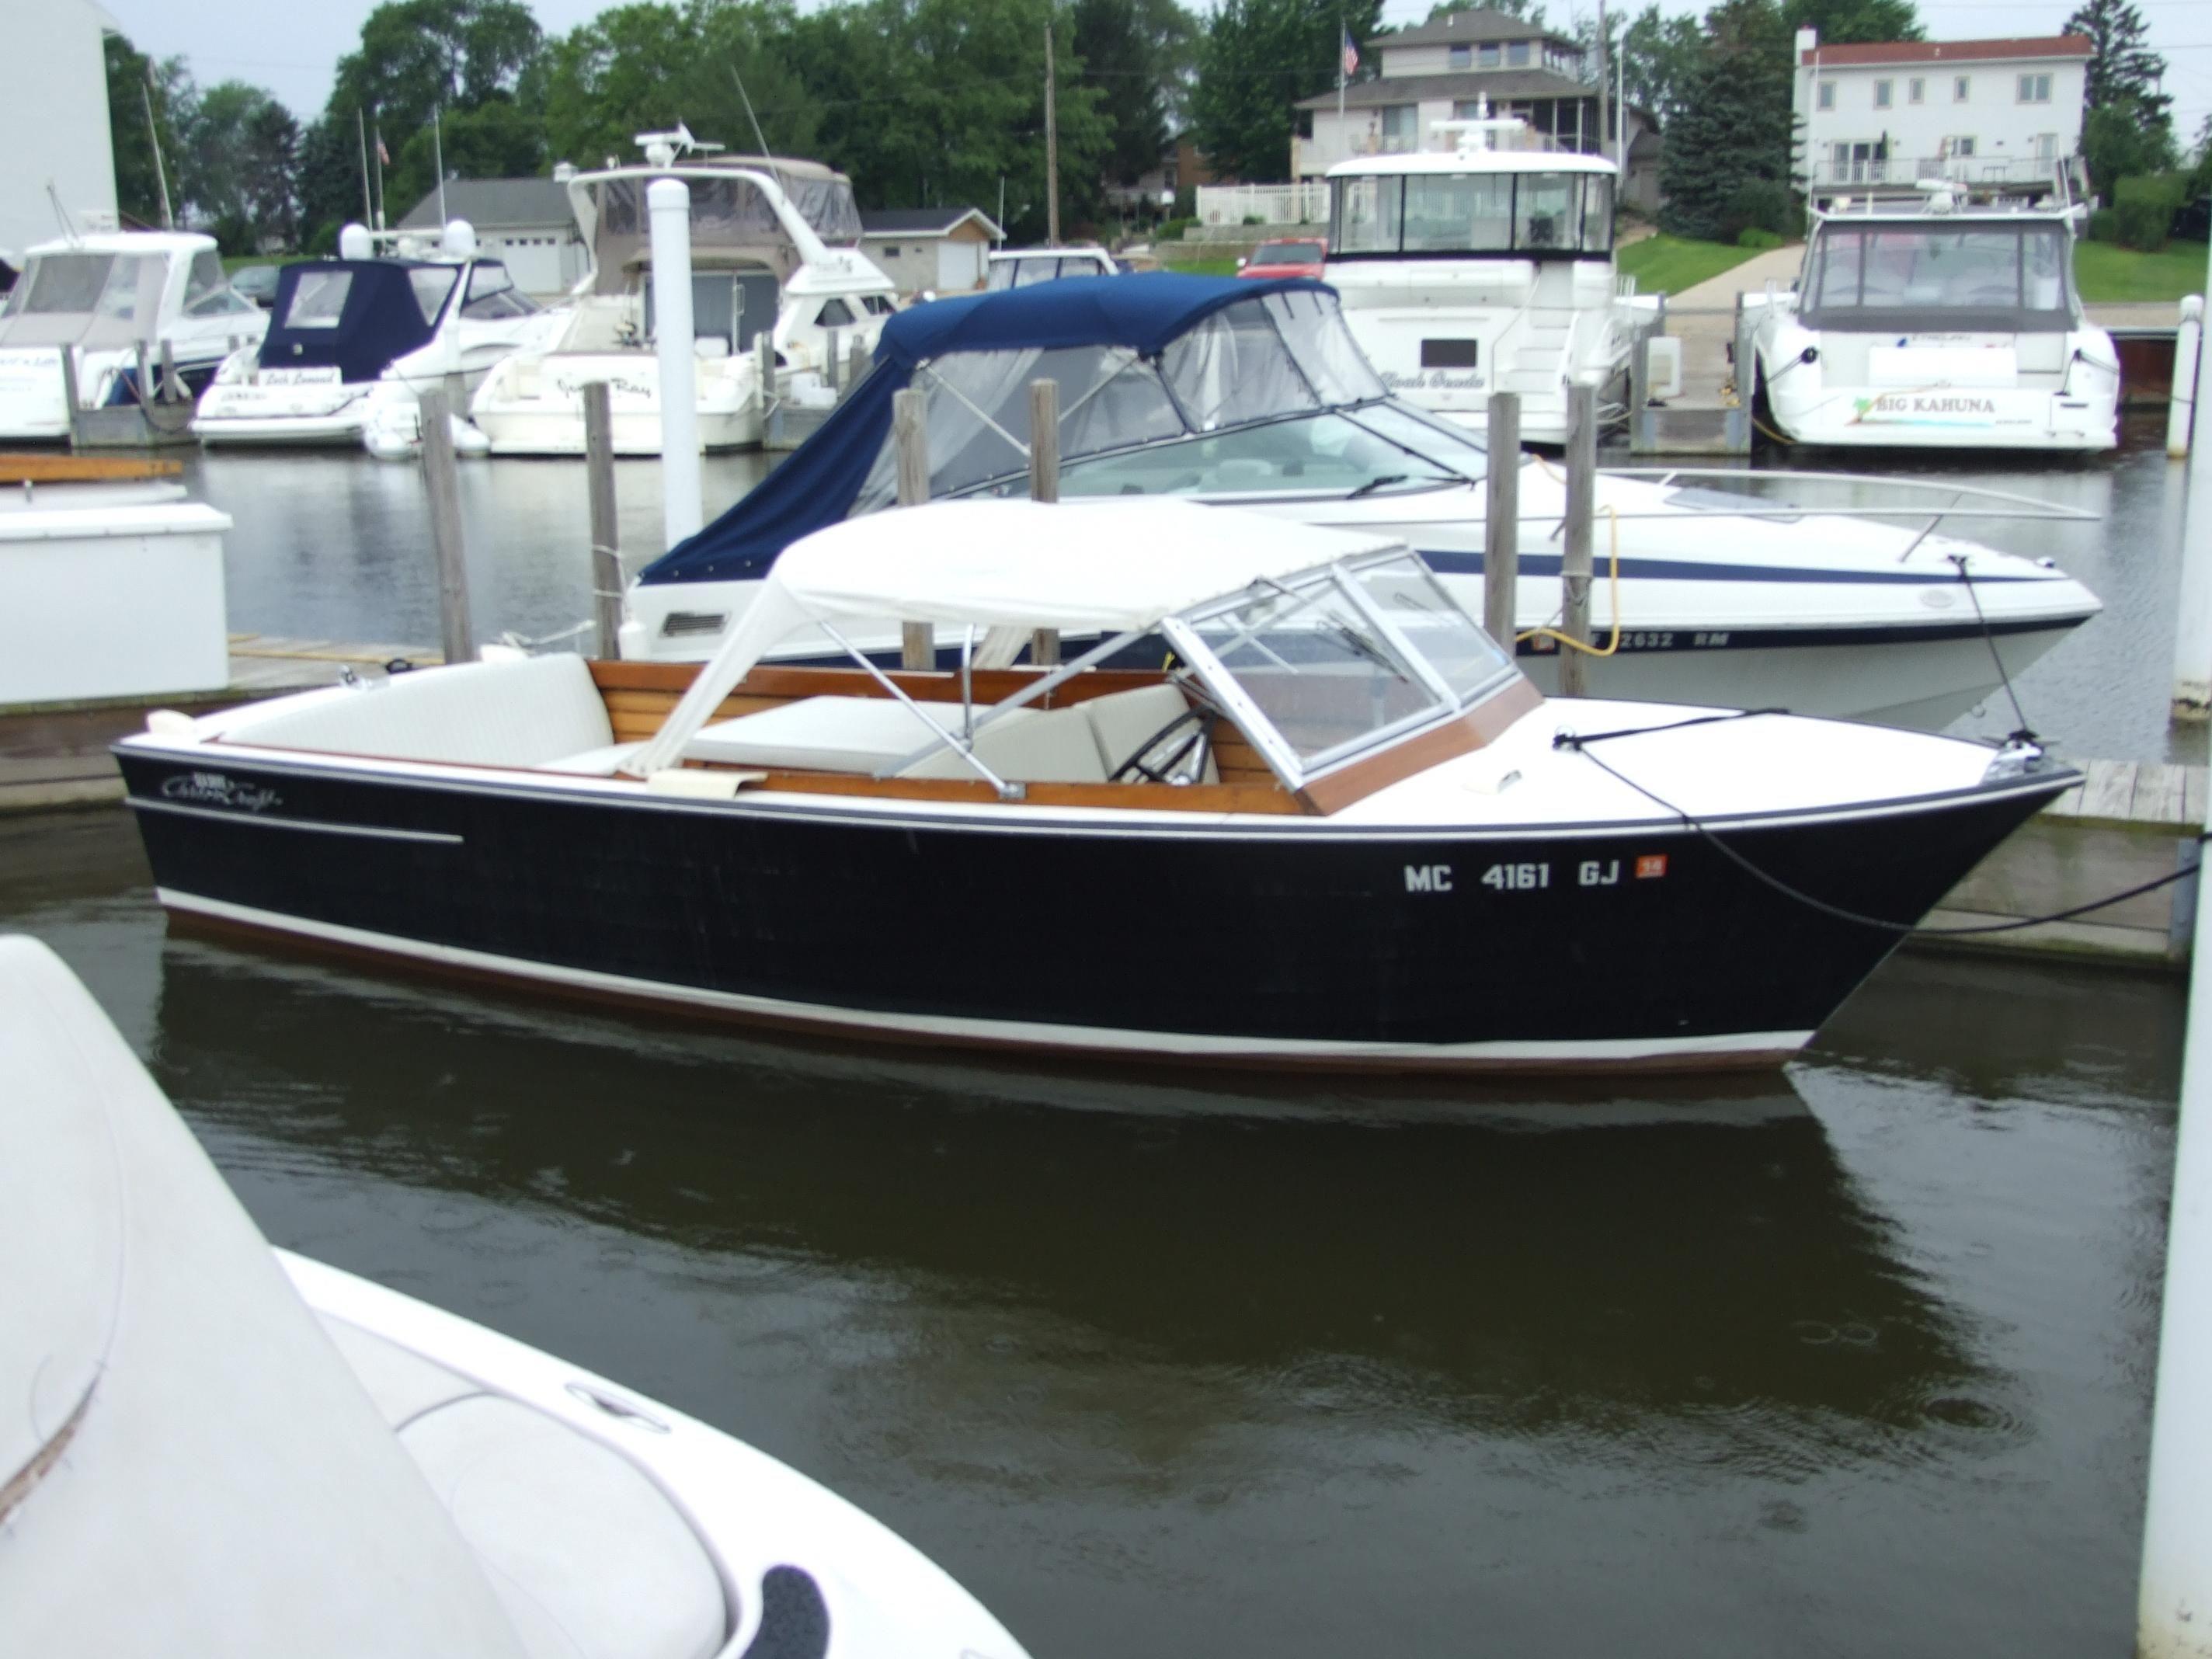 1965 chris craft sea skiff power boat for sale www for Skiff craft boats for sale